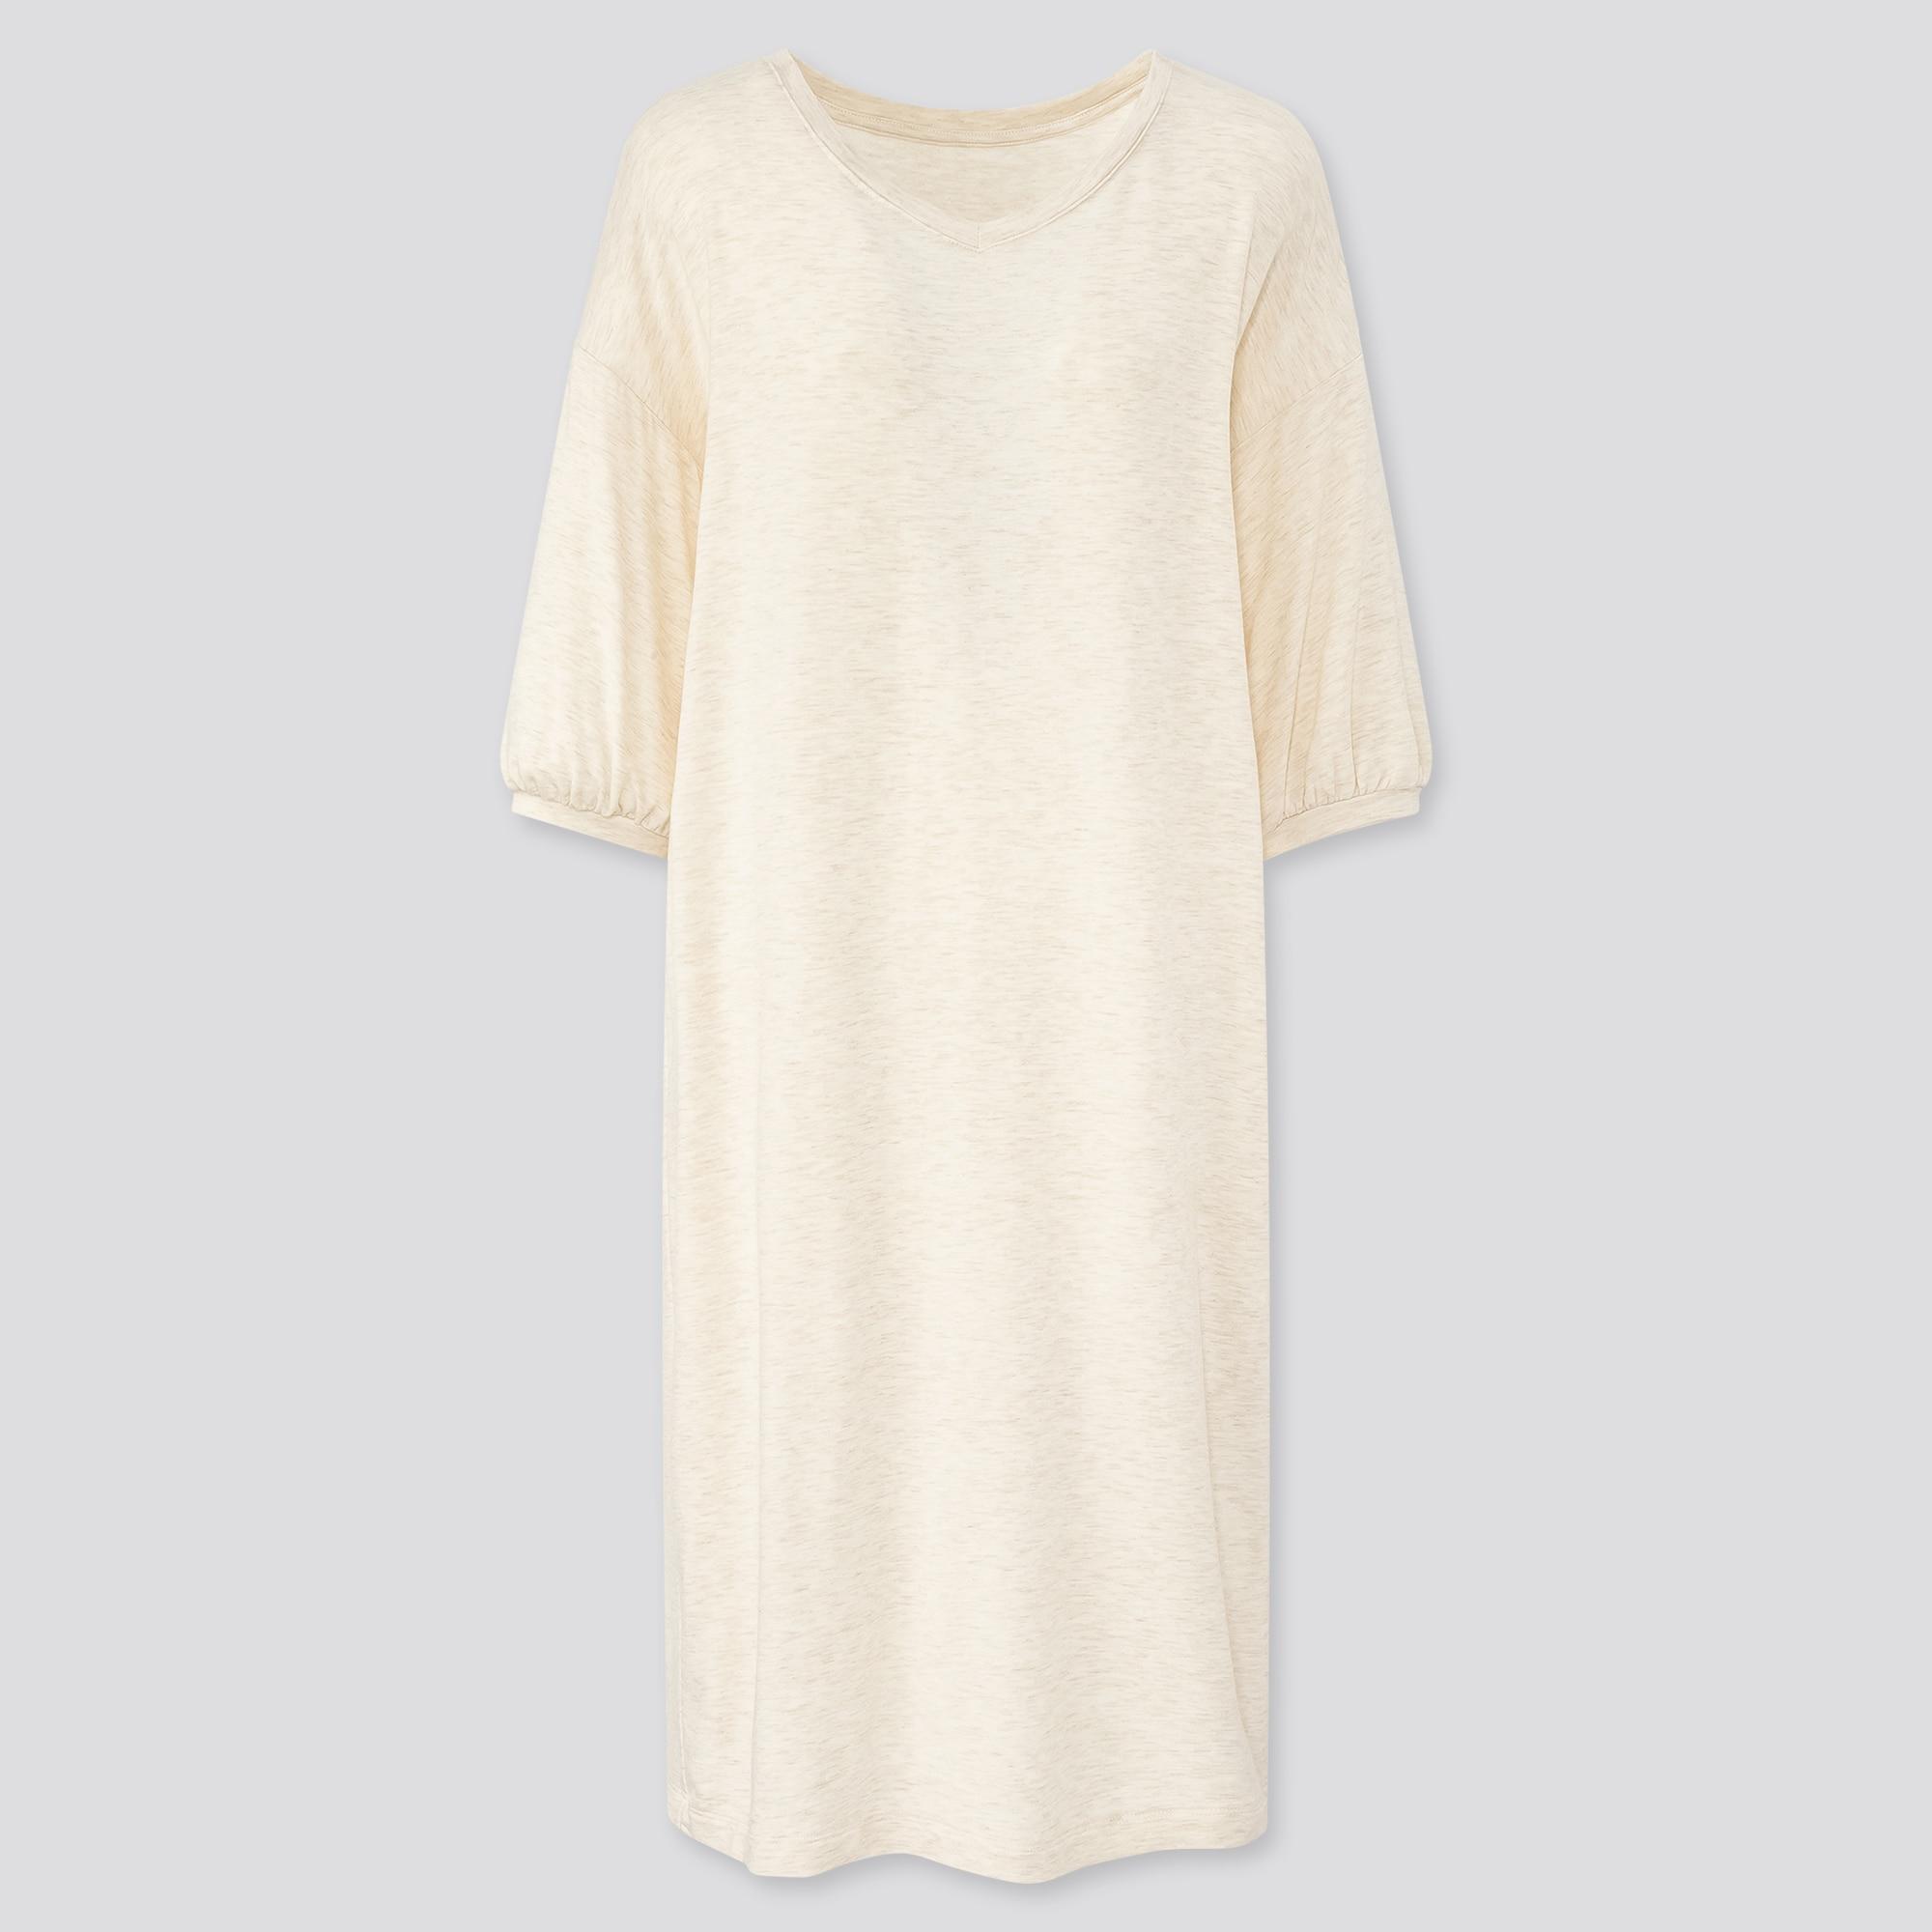 Uniqlo women ultra stretch soft 3/4 sleeve dress